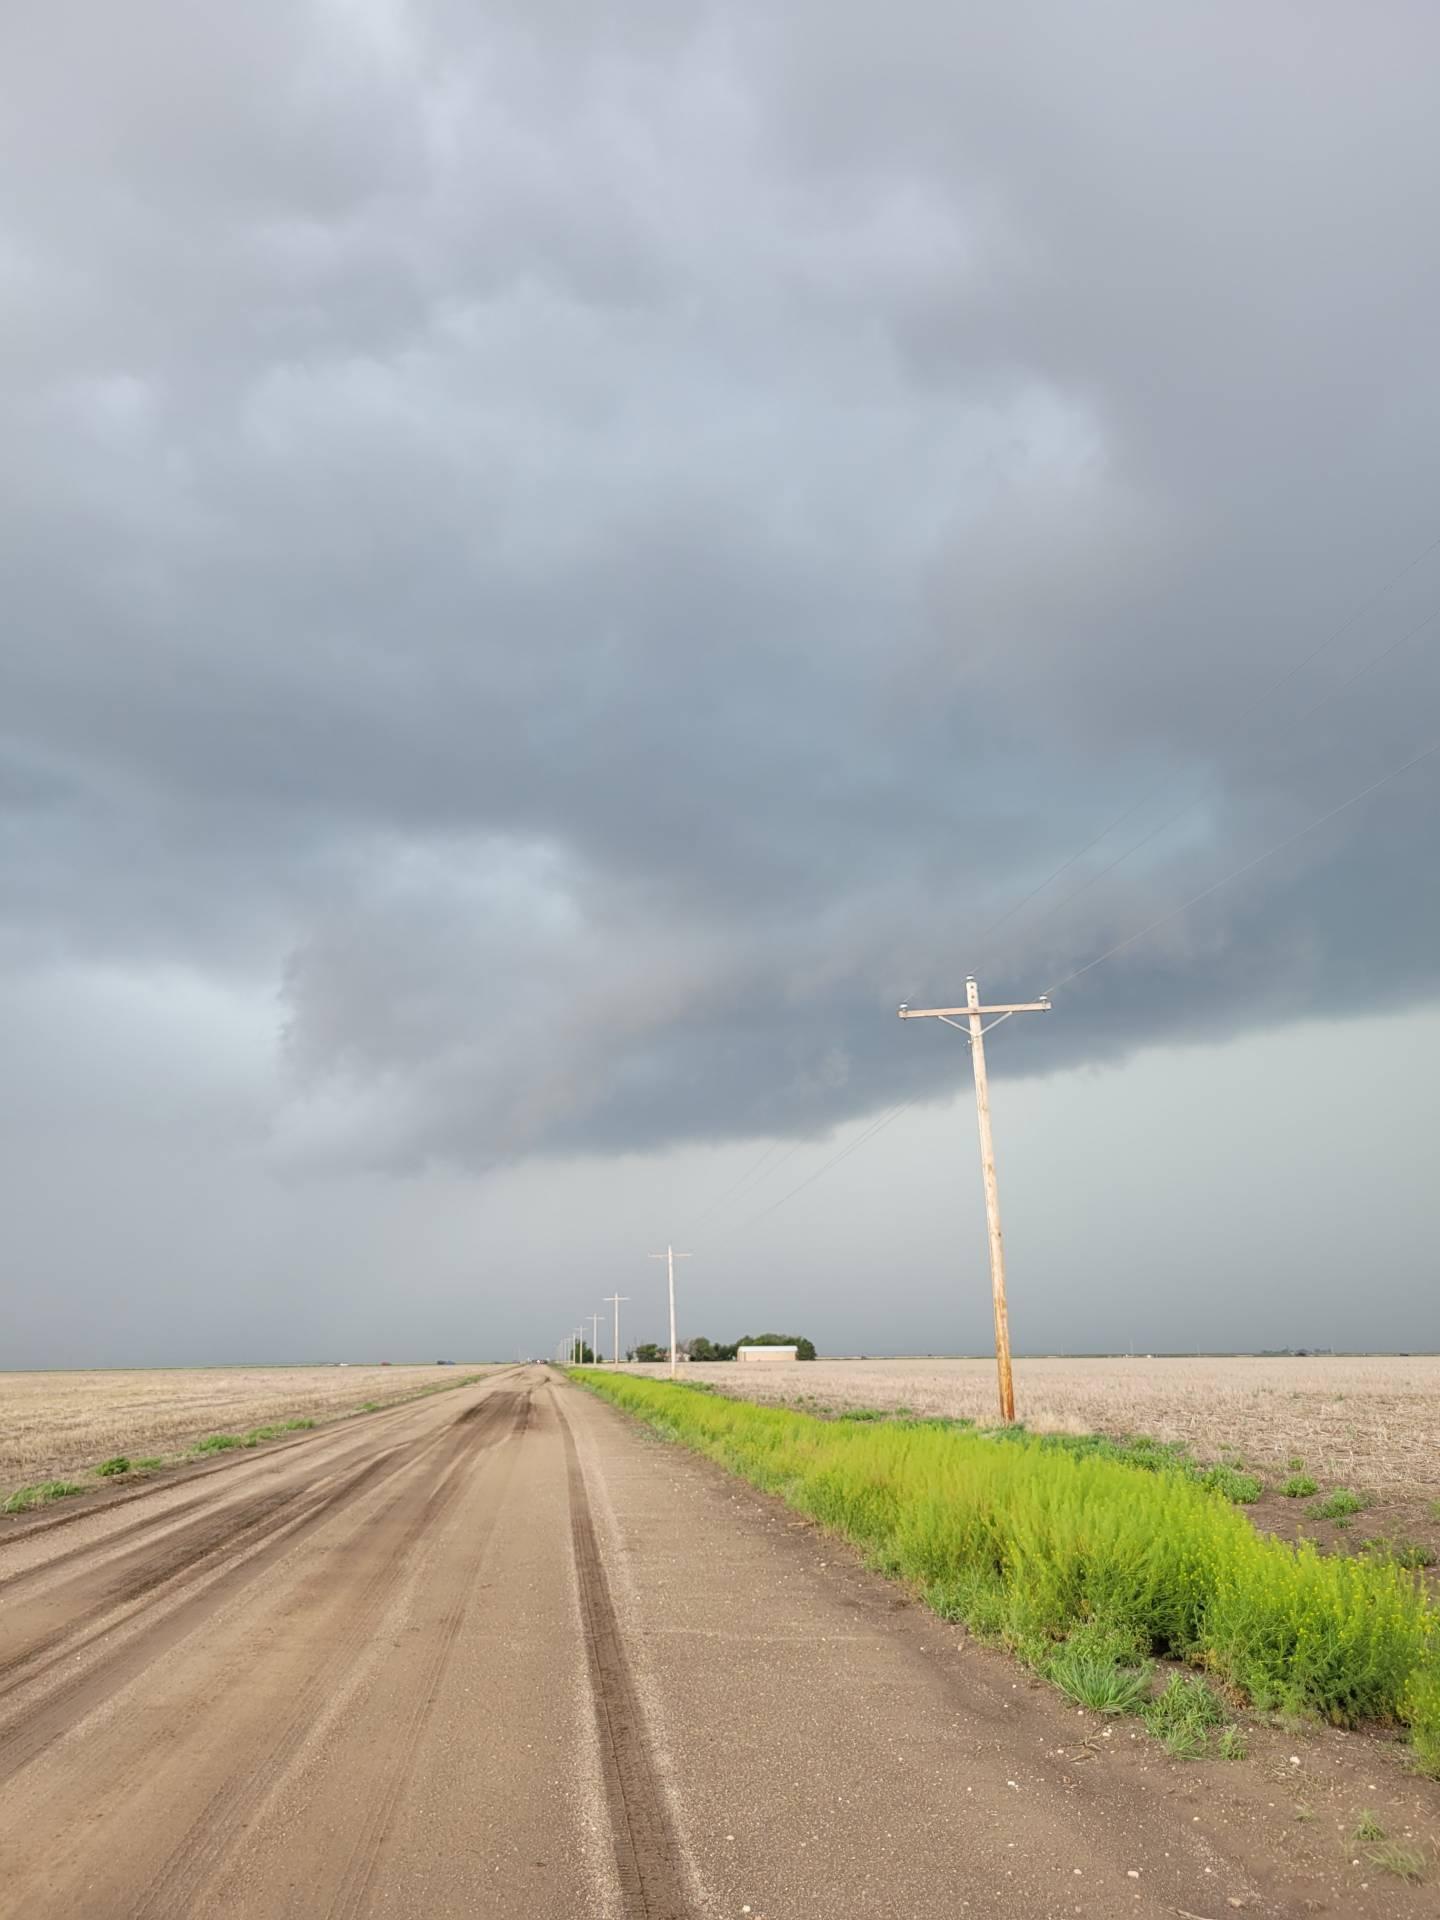 Severe storm north of Leoti, Kansas. #kswx @highwaysandhail